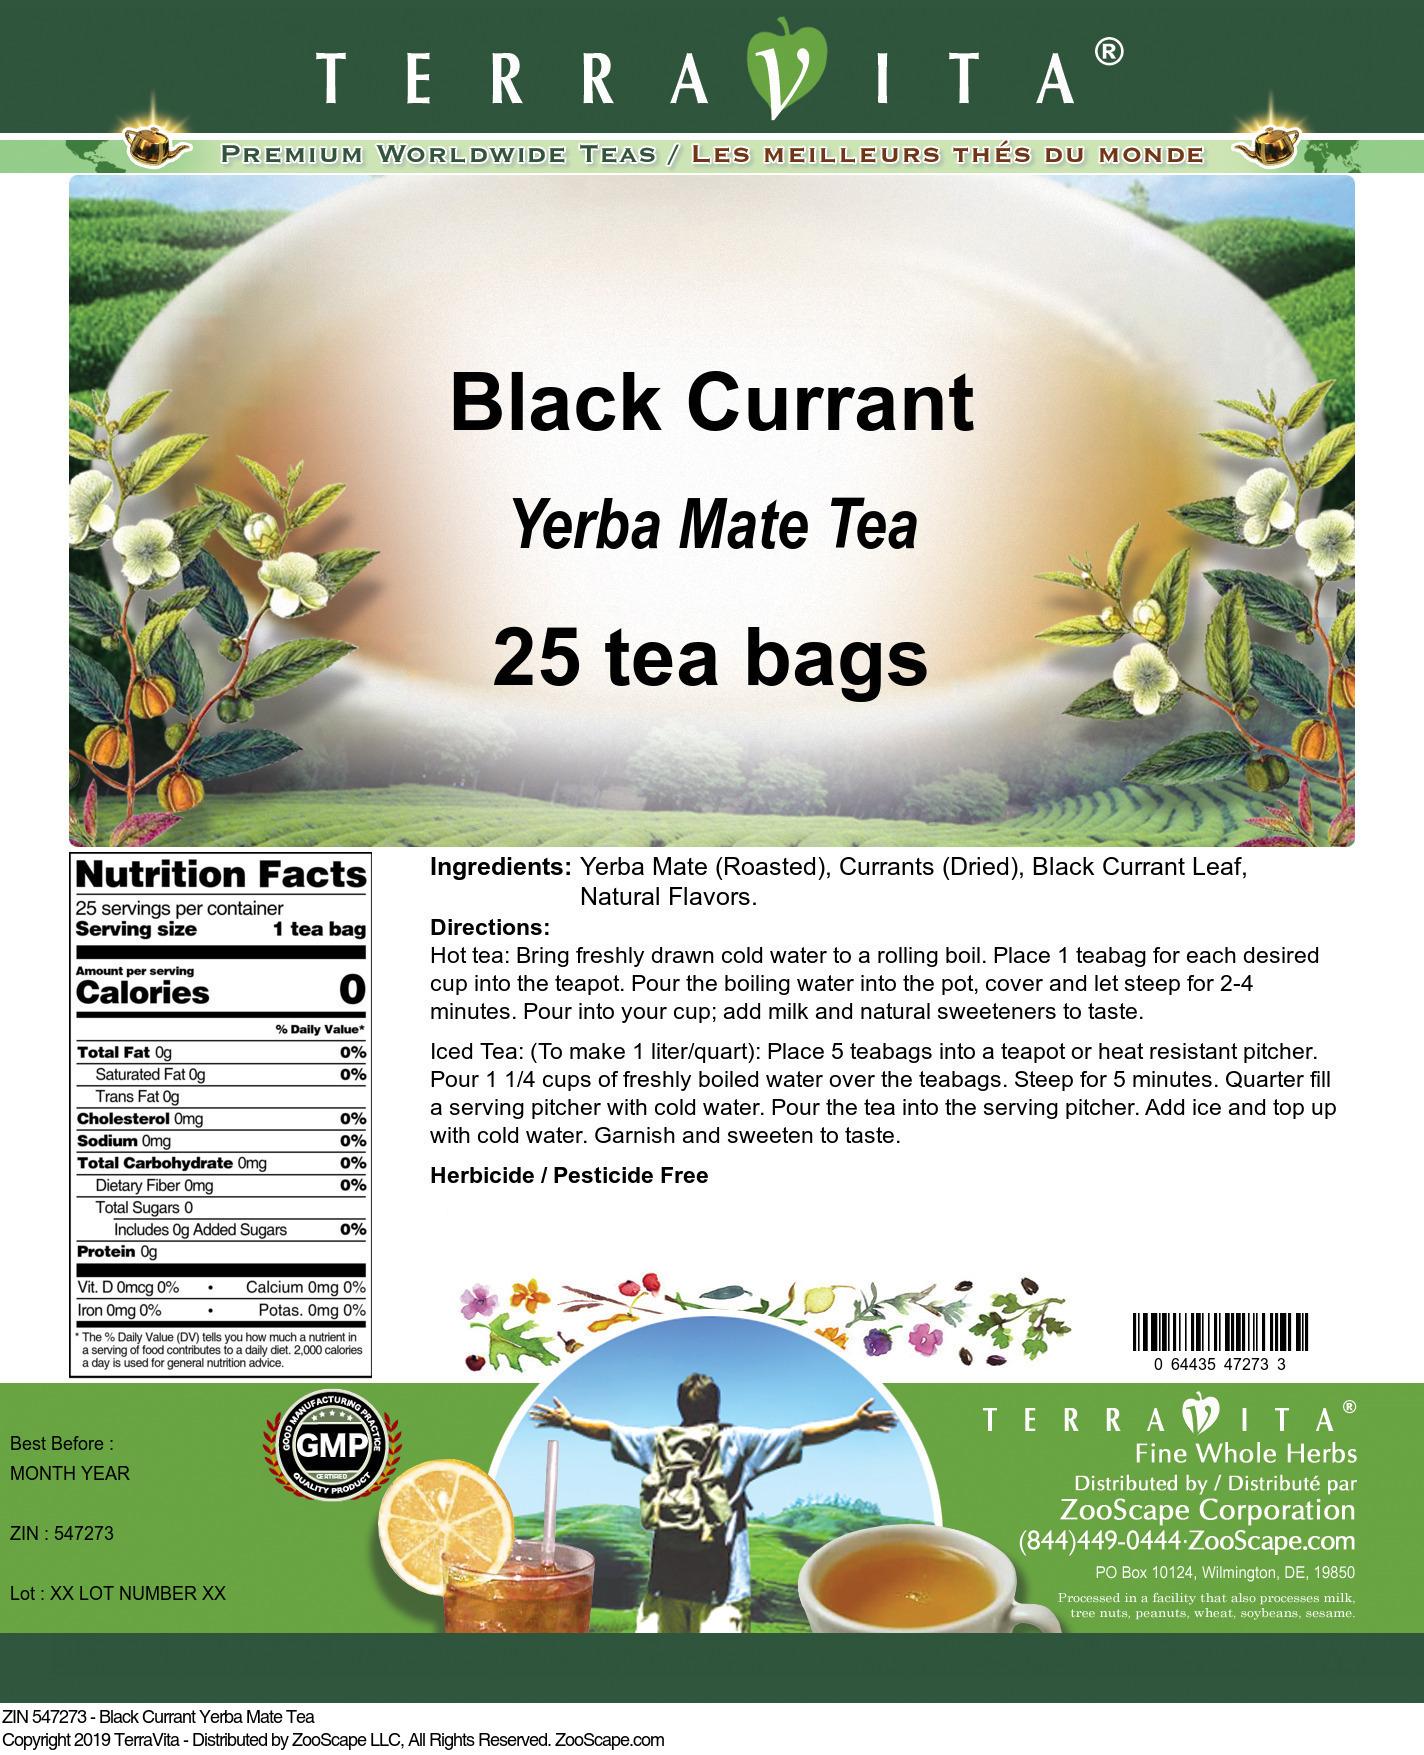 Black Currant Yerba Mate